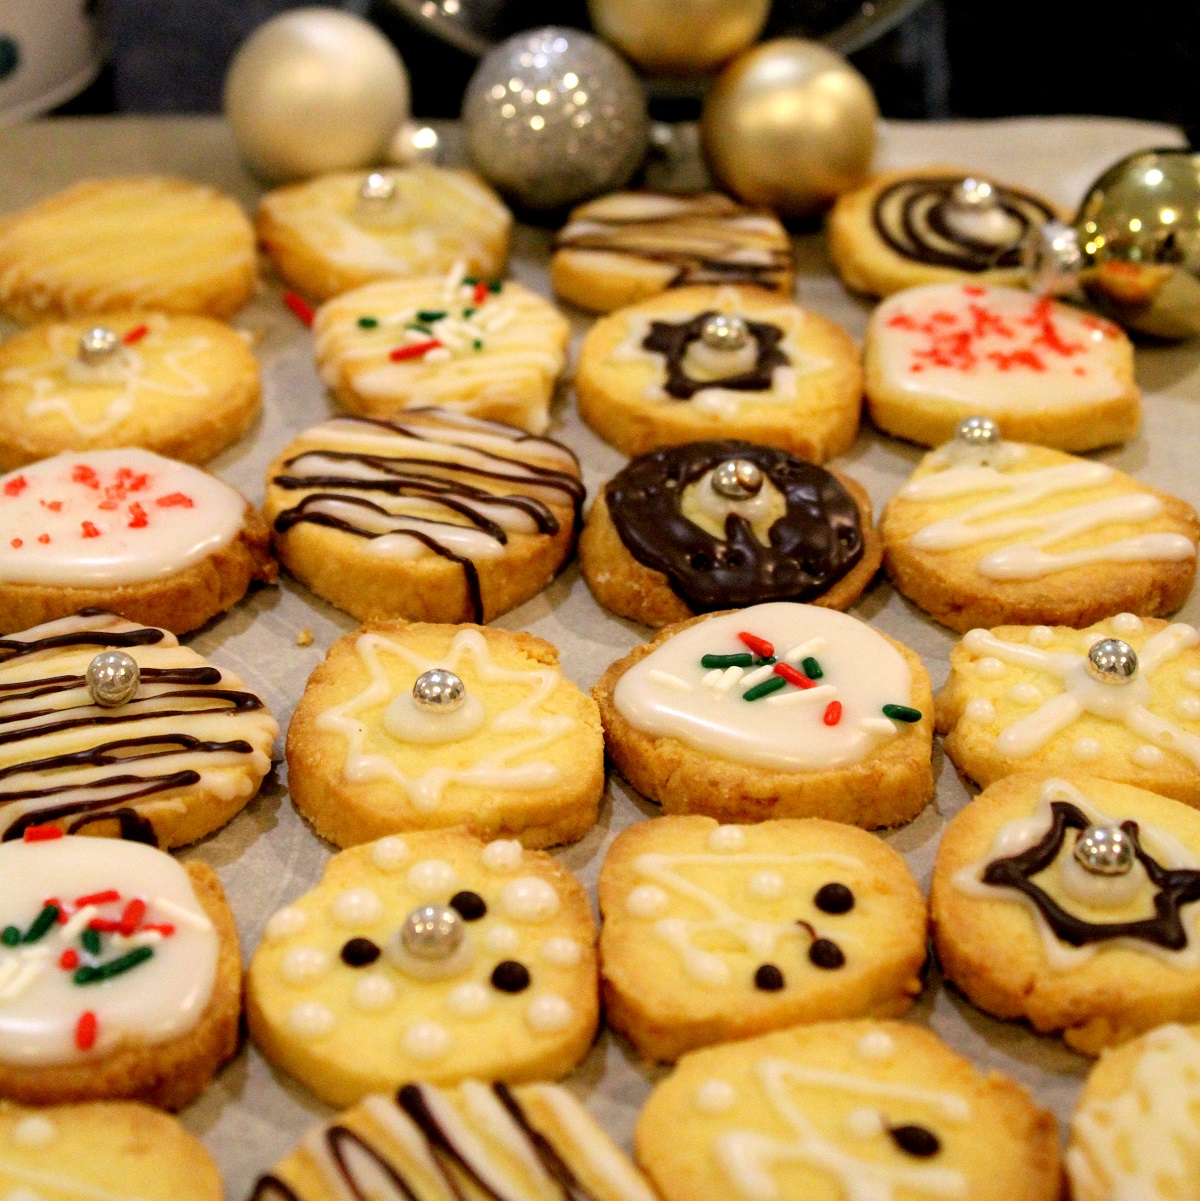 FoodInspires.com - Professional Chef Services - 2014 Christmas Cookie, #4 - Lemon Cookies